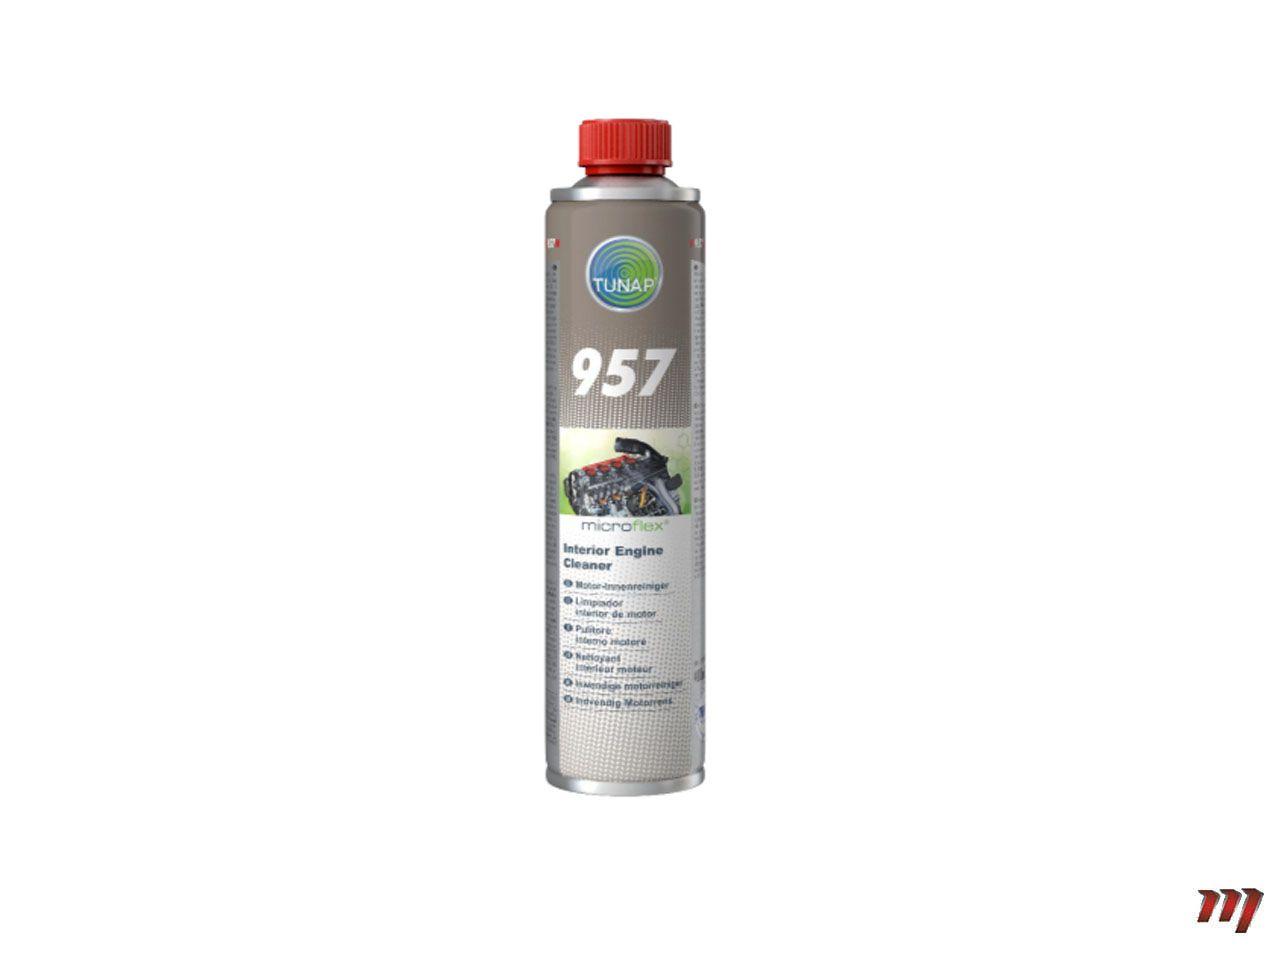 Limpeza Interna do Motor Tunap 957  - Mirai Peças Toyota